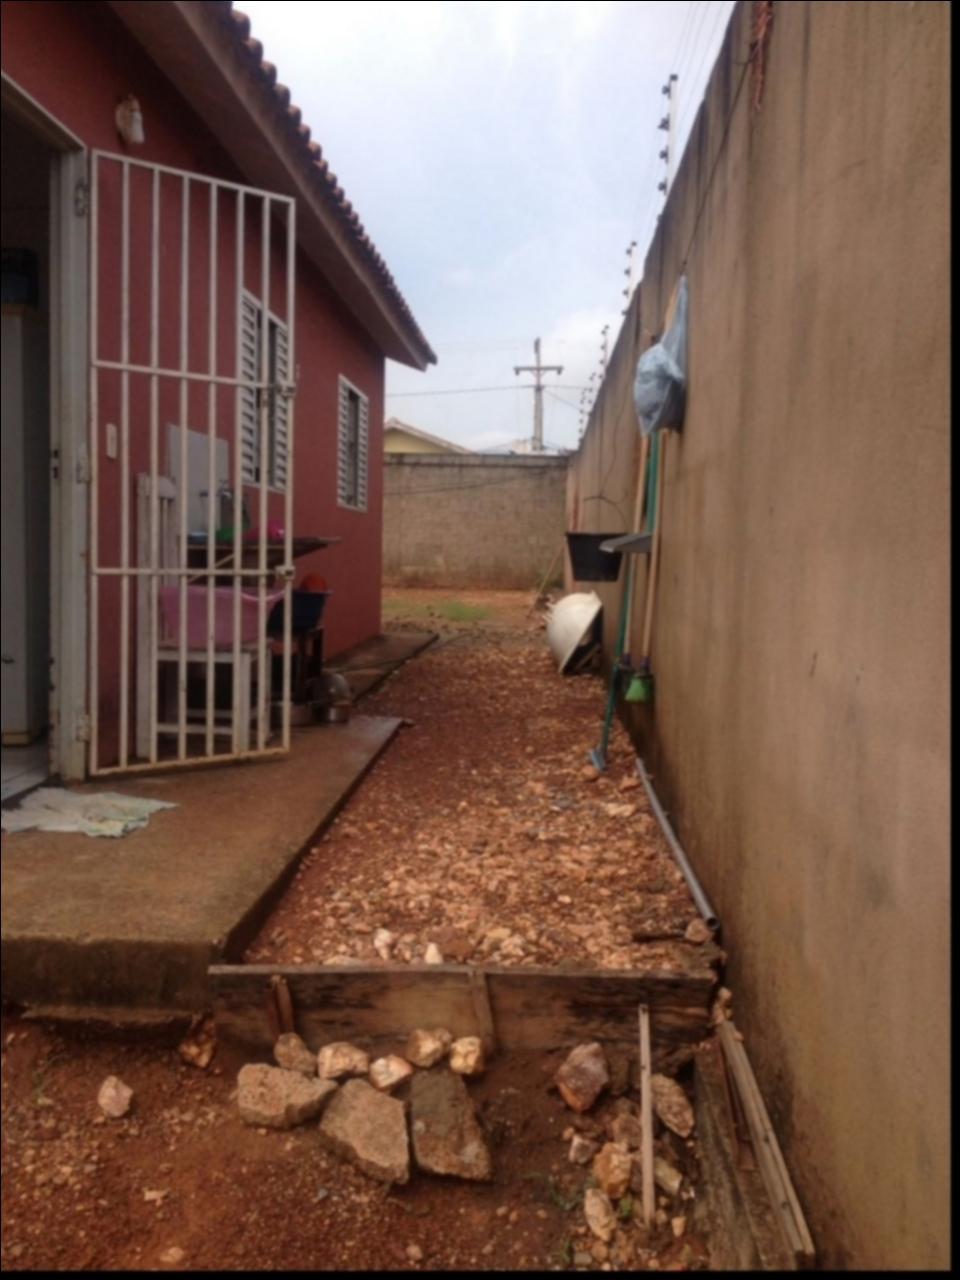 Casa  com 3 quartos no JOSE CARLOS GUIMARAES, Várzea Grande  - MT